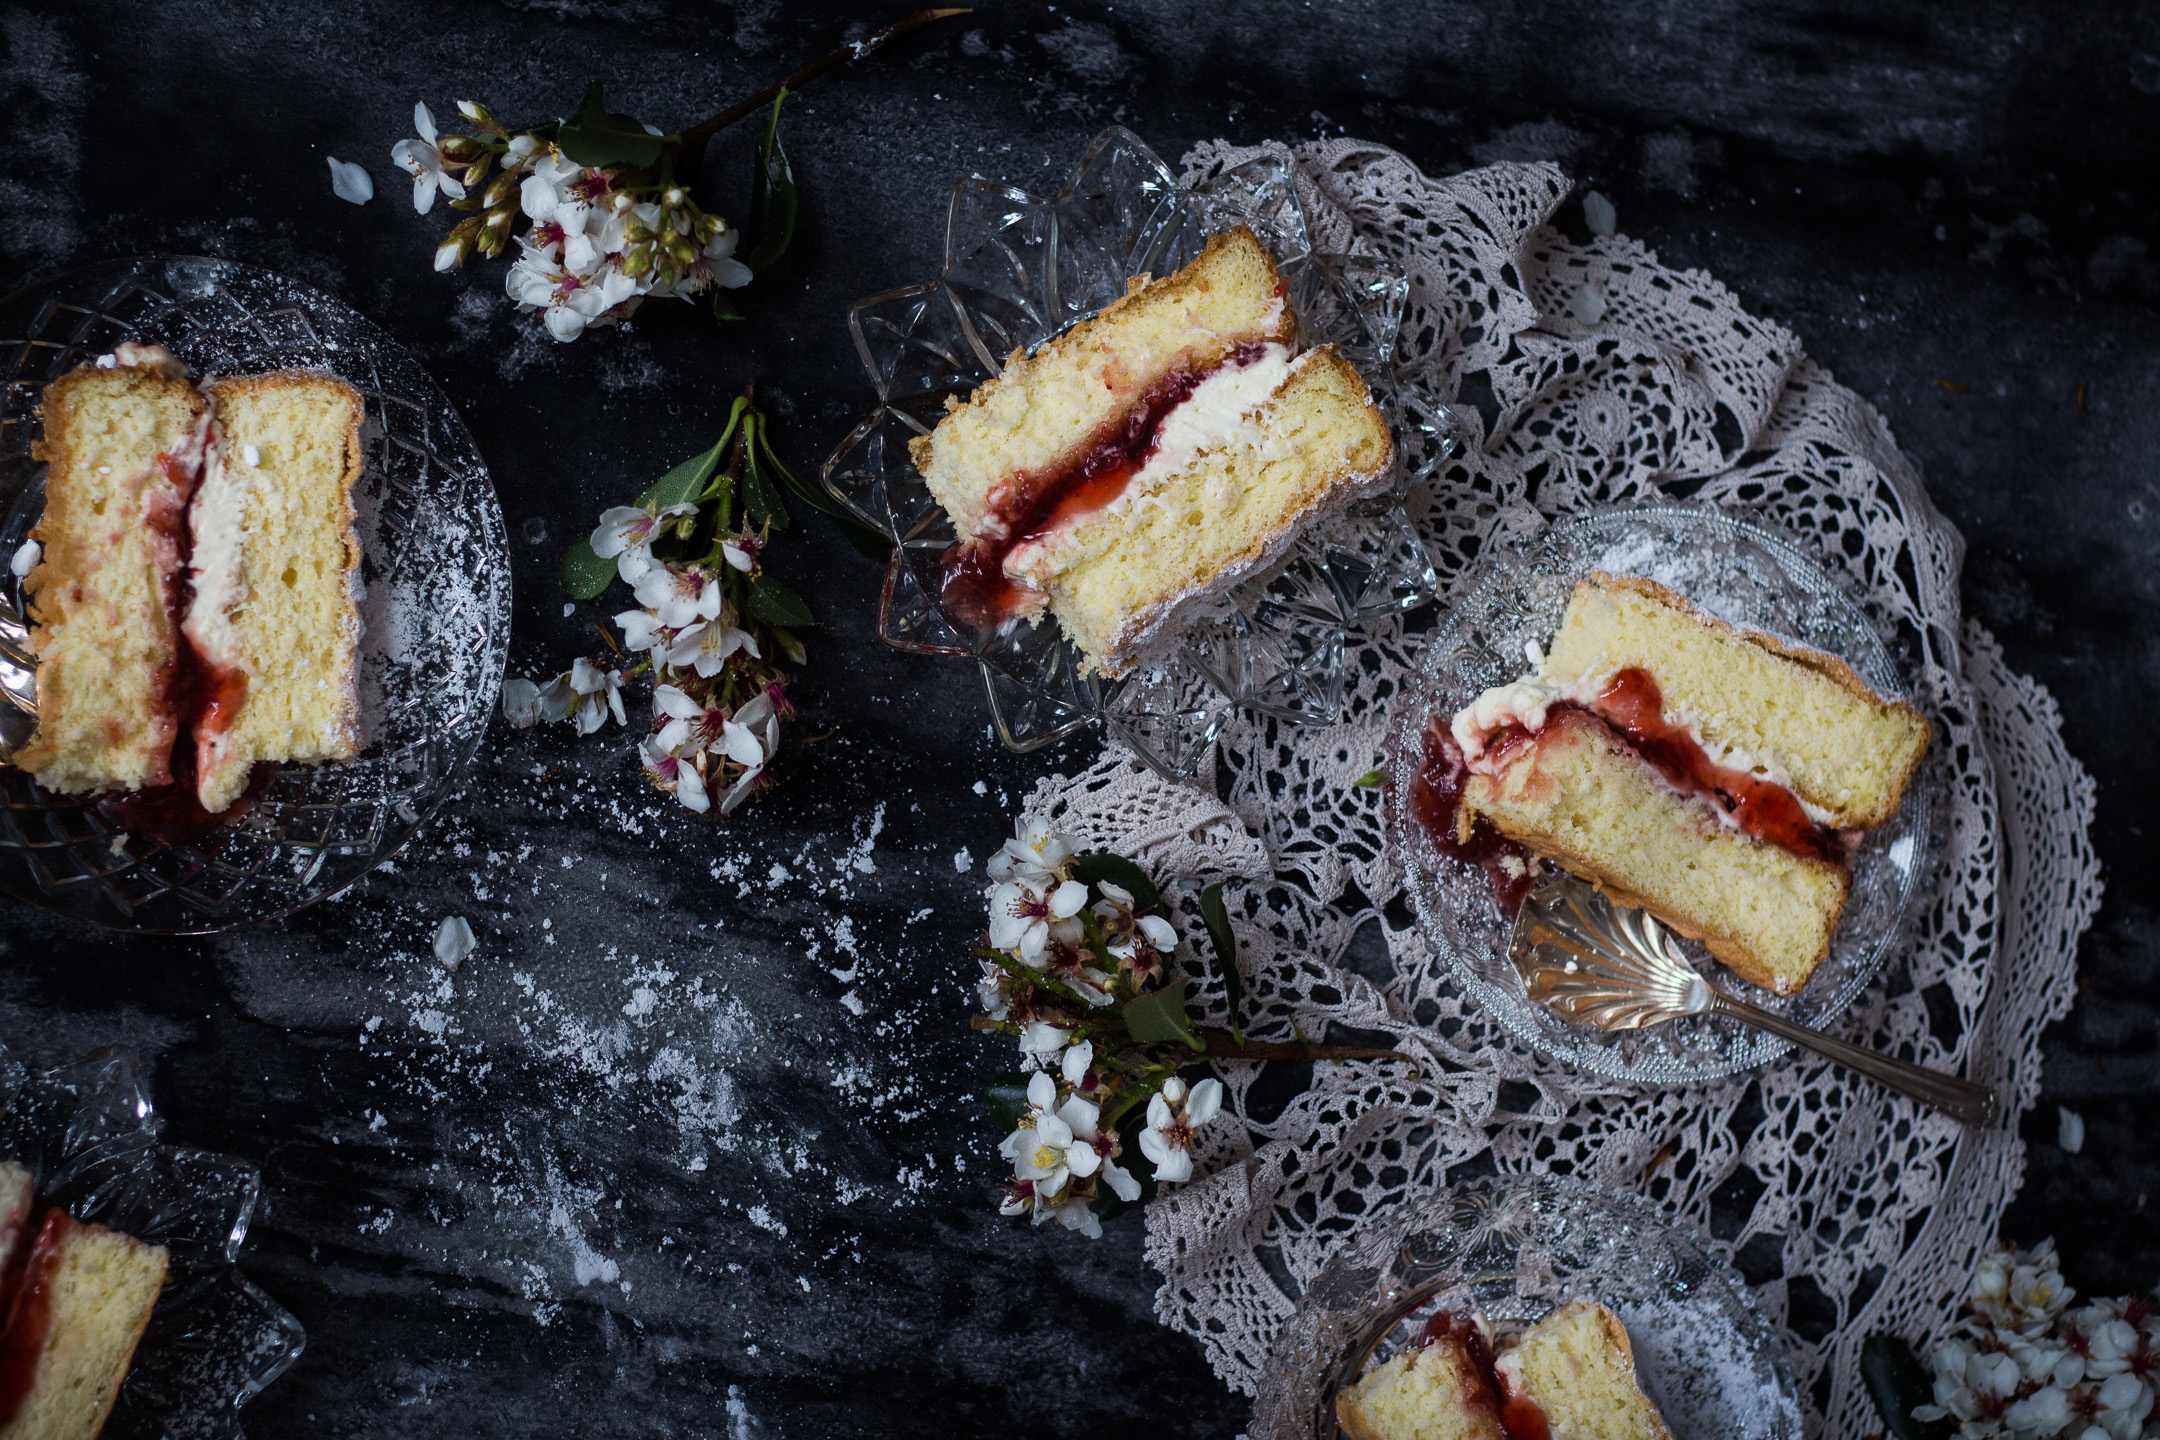 victorian-sponge-cake-gluten-free-recipe-9